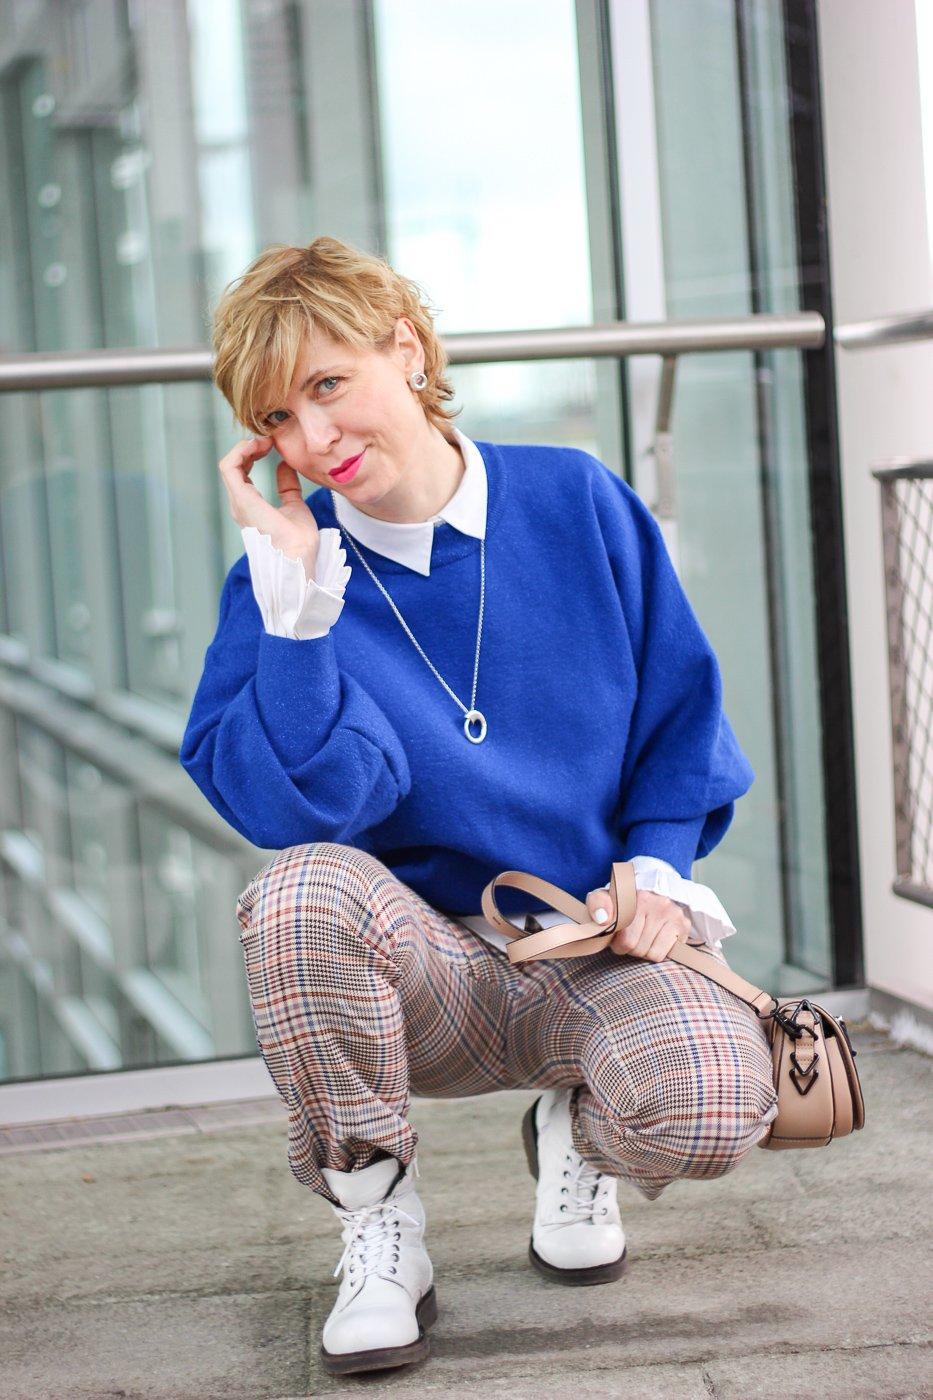 conny doll lifestyle: Outfitvariationen für den Übergang - Karohose, blauer Pullover, Frühlingsstyling